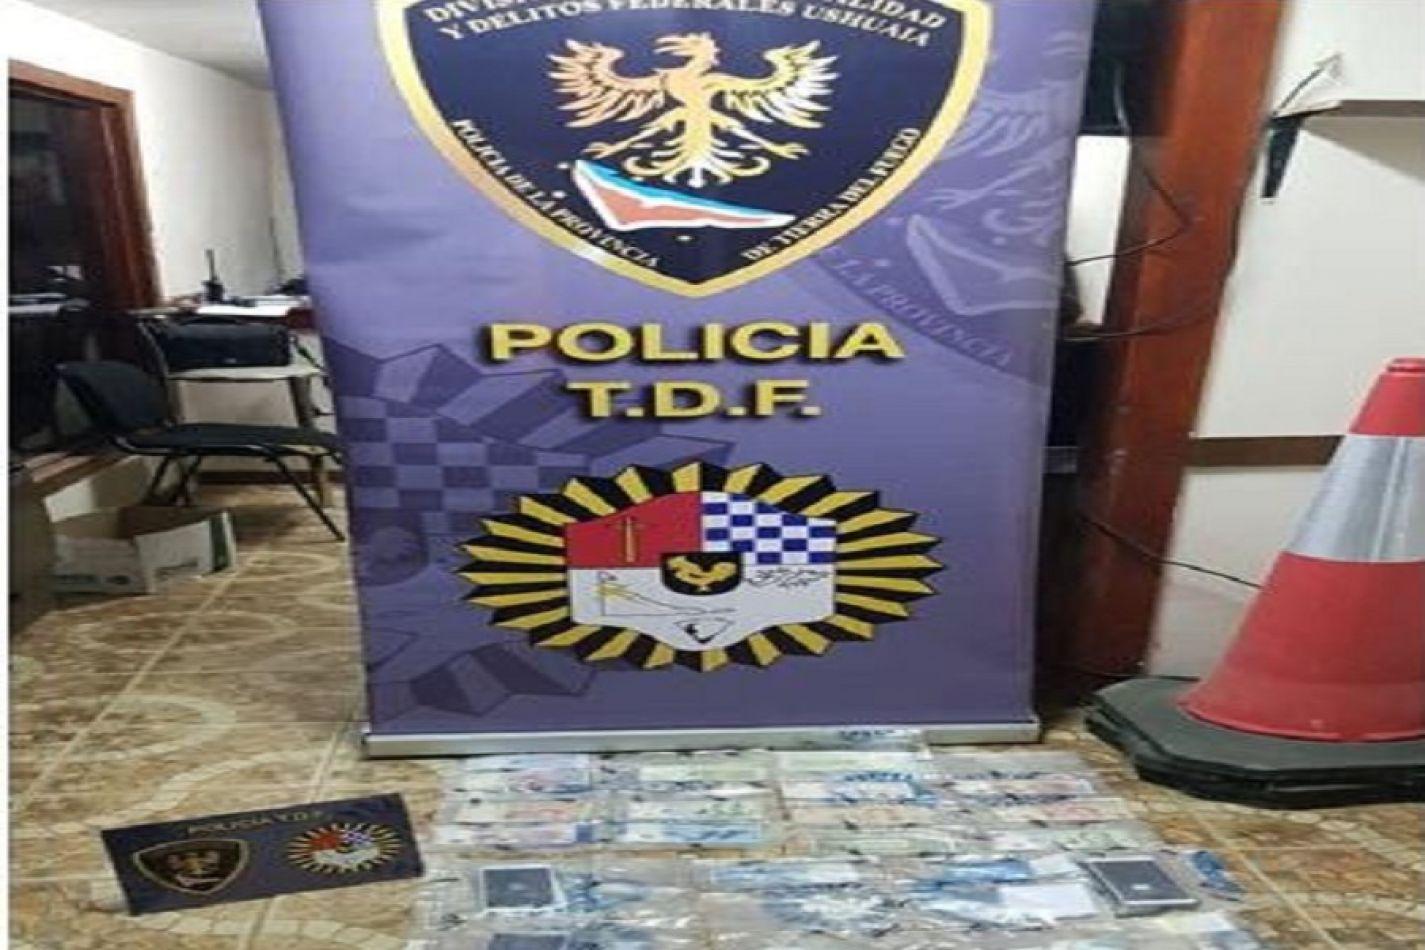 Policia provincial detuvo a dos sujetos que transportaban cocaína en un remis